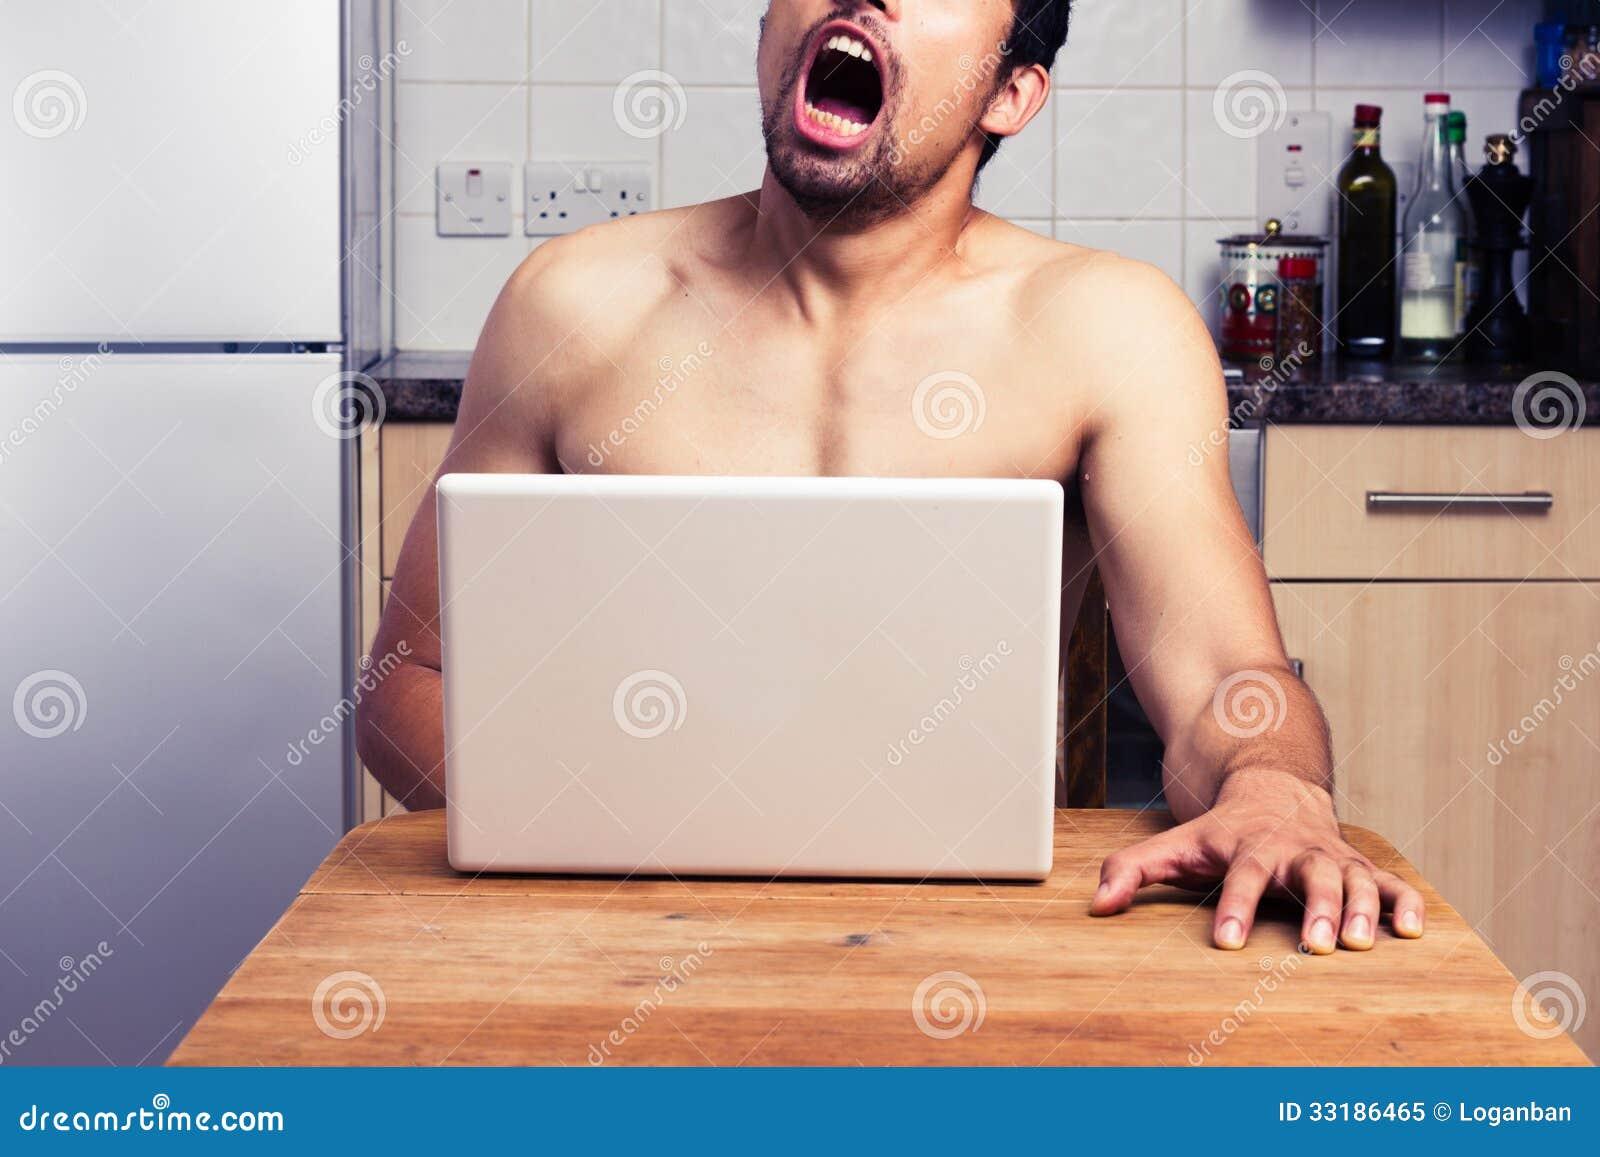 Naked Man Masturbating 69